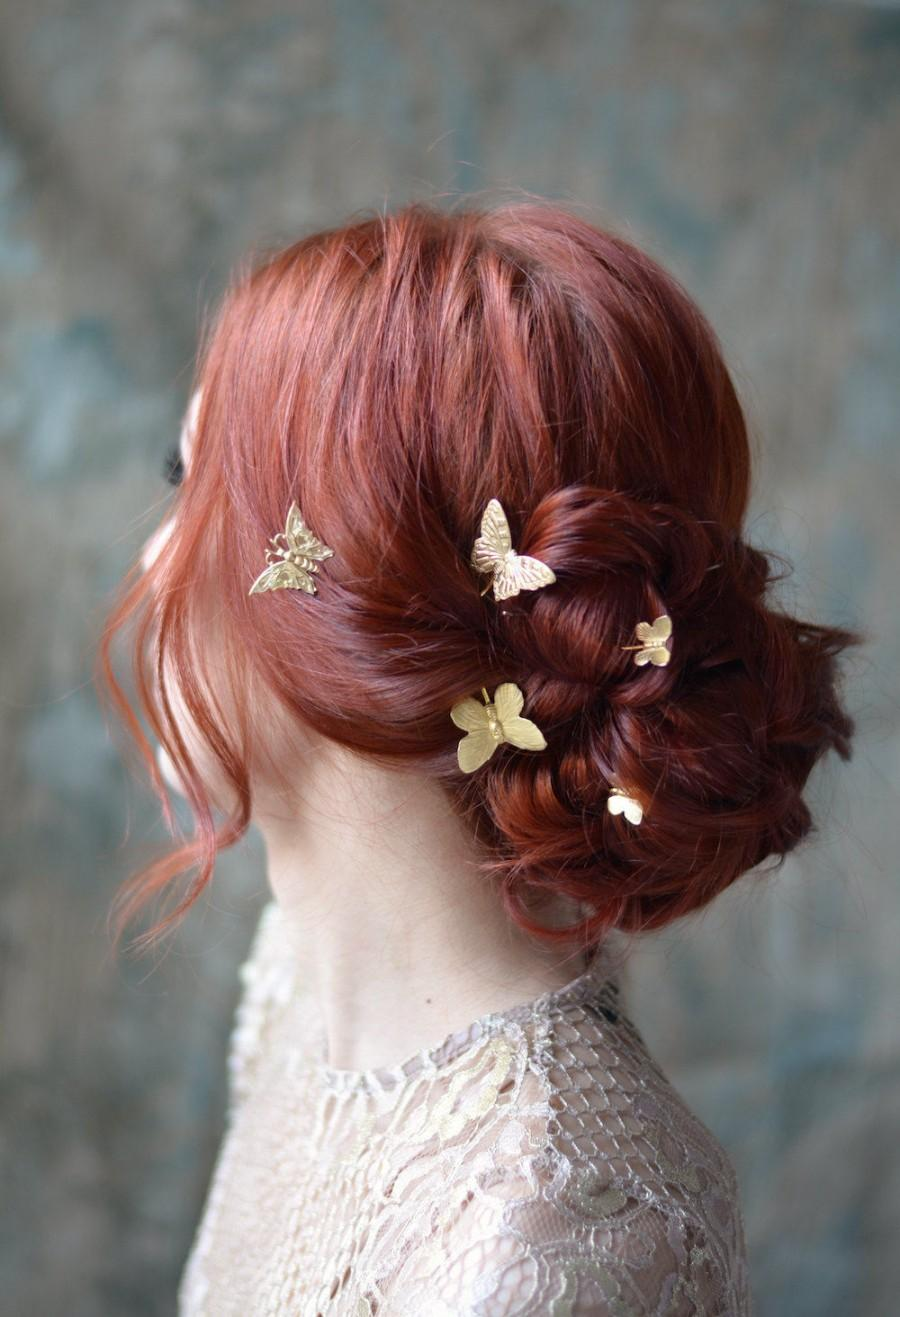 how-to-style-hair-accessories-claw-clips-butterfly-banana-mini-wedding-easy-bun-decorative.jpg